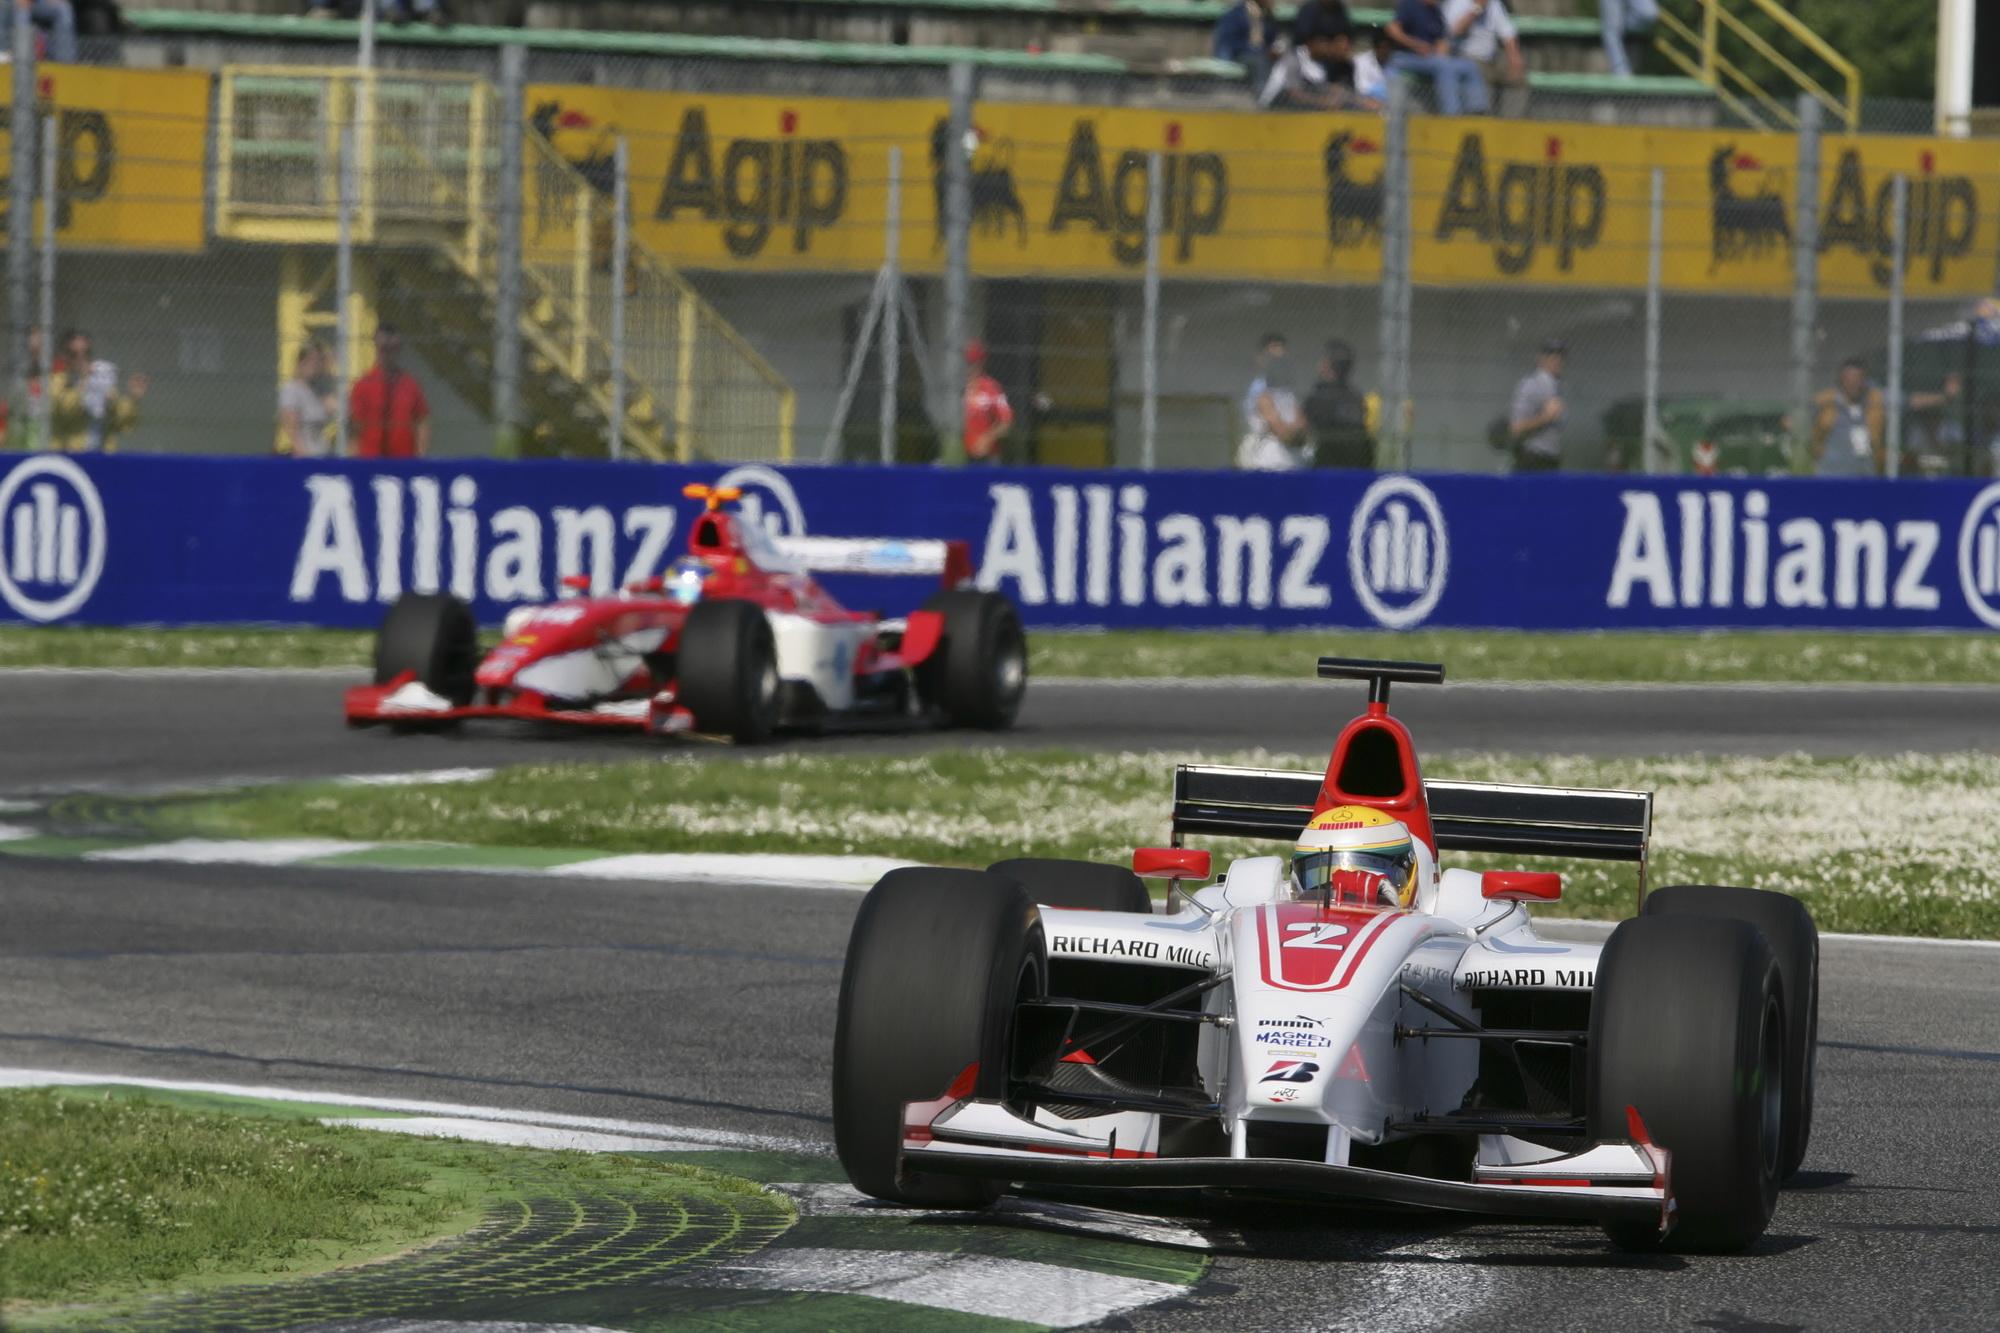 Hamilton na drugoj utrci GP2 prvenstva u Imoli (22.4.2006.) Foto: GP2 Series Media Service